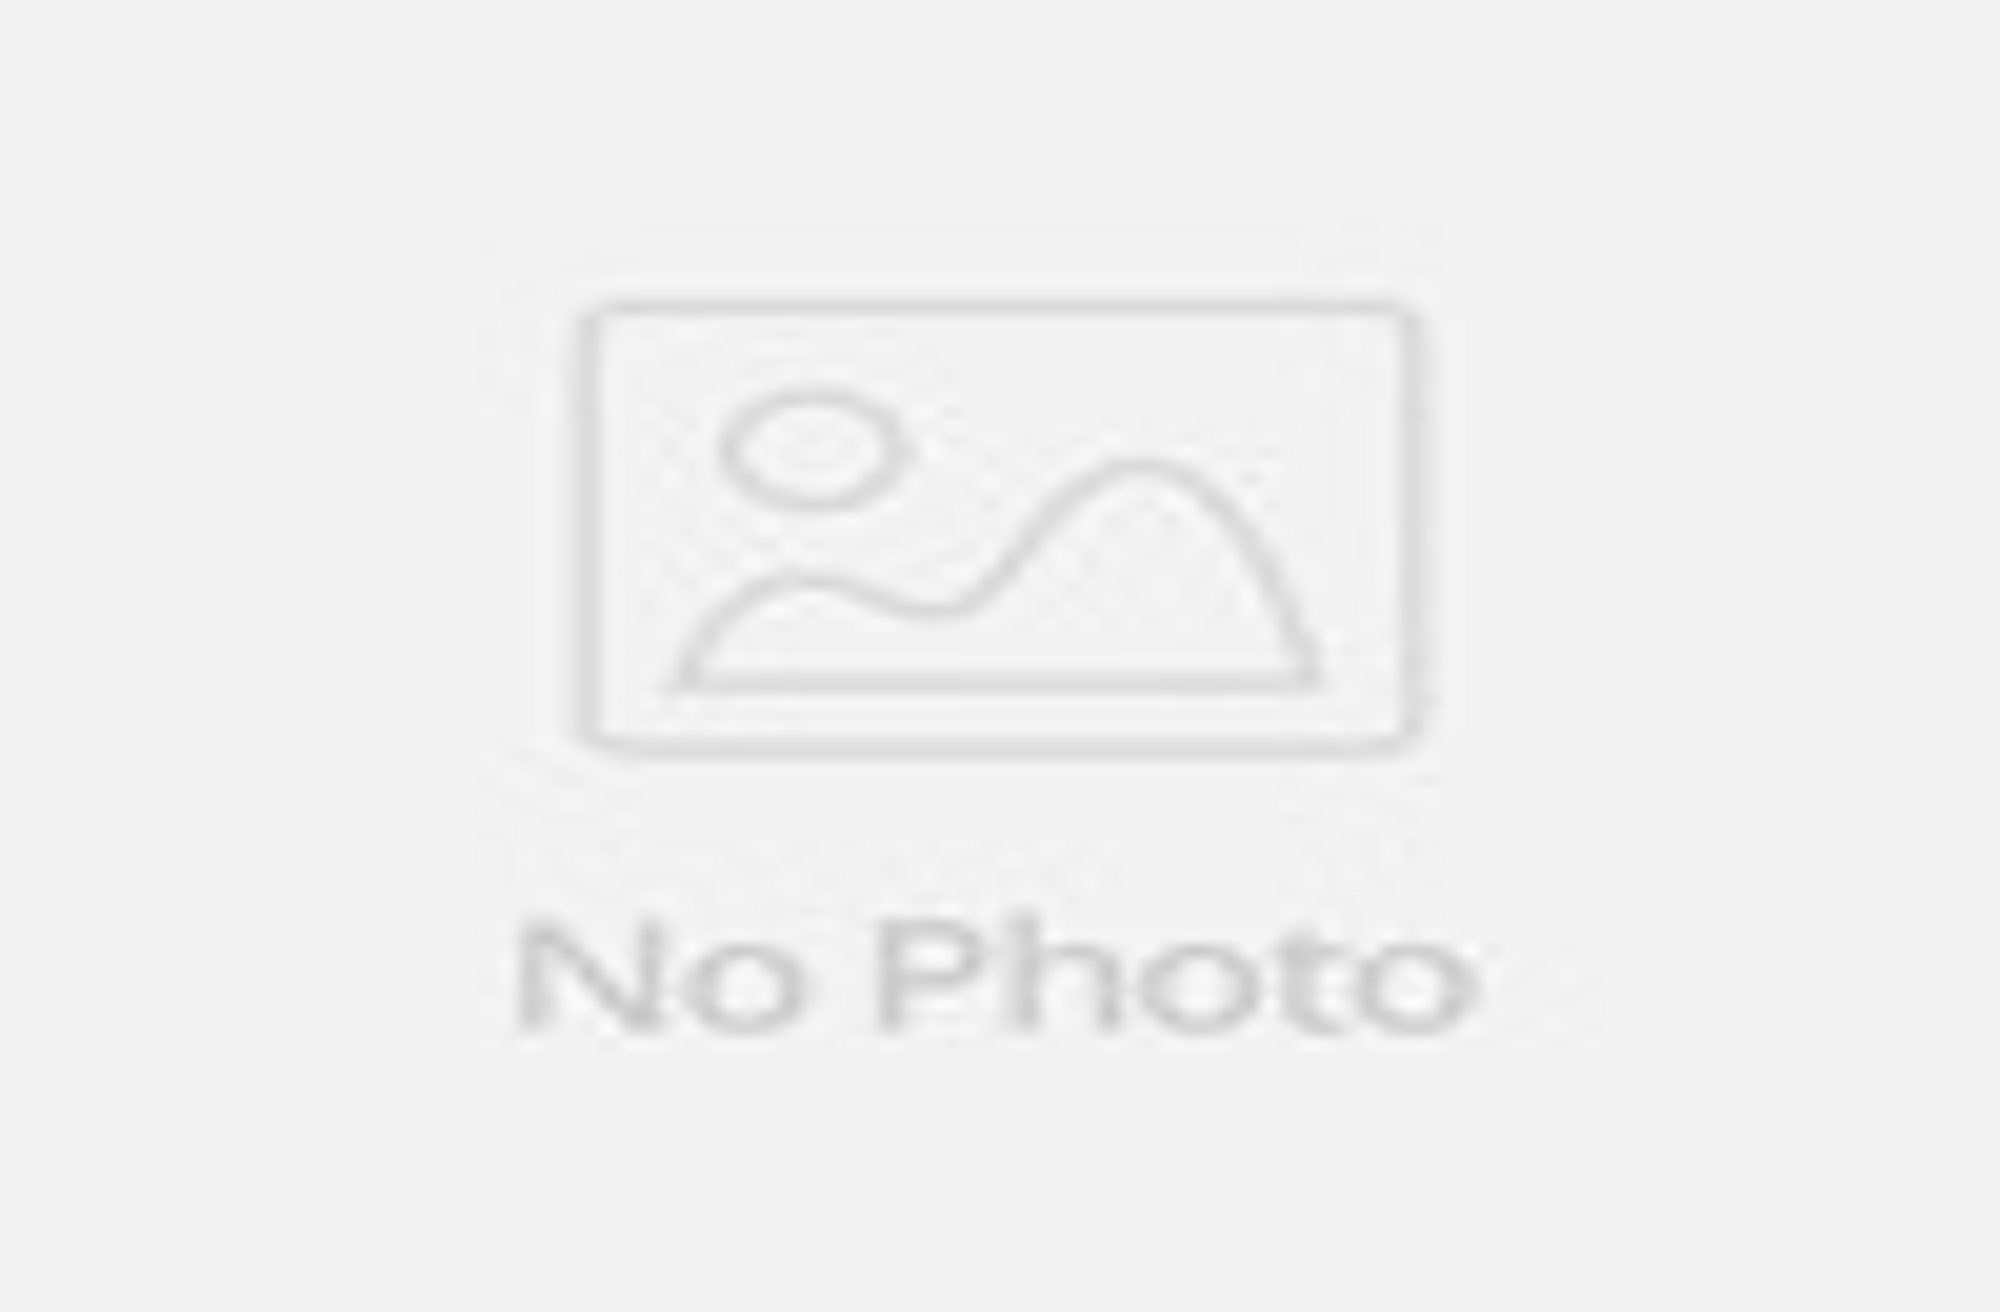 Eatfish for Boneless fish grill